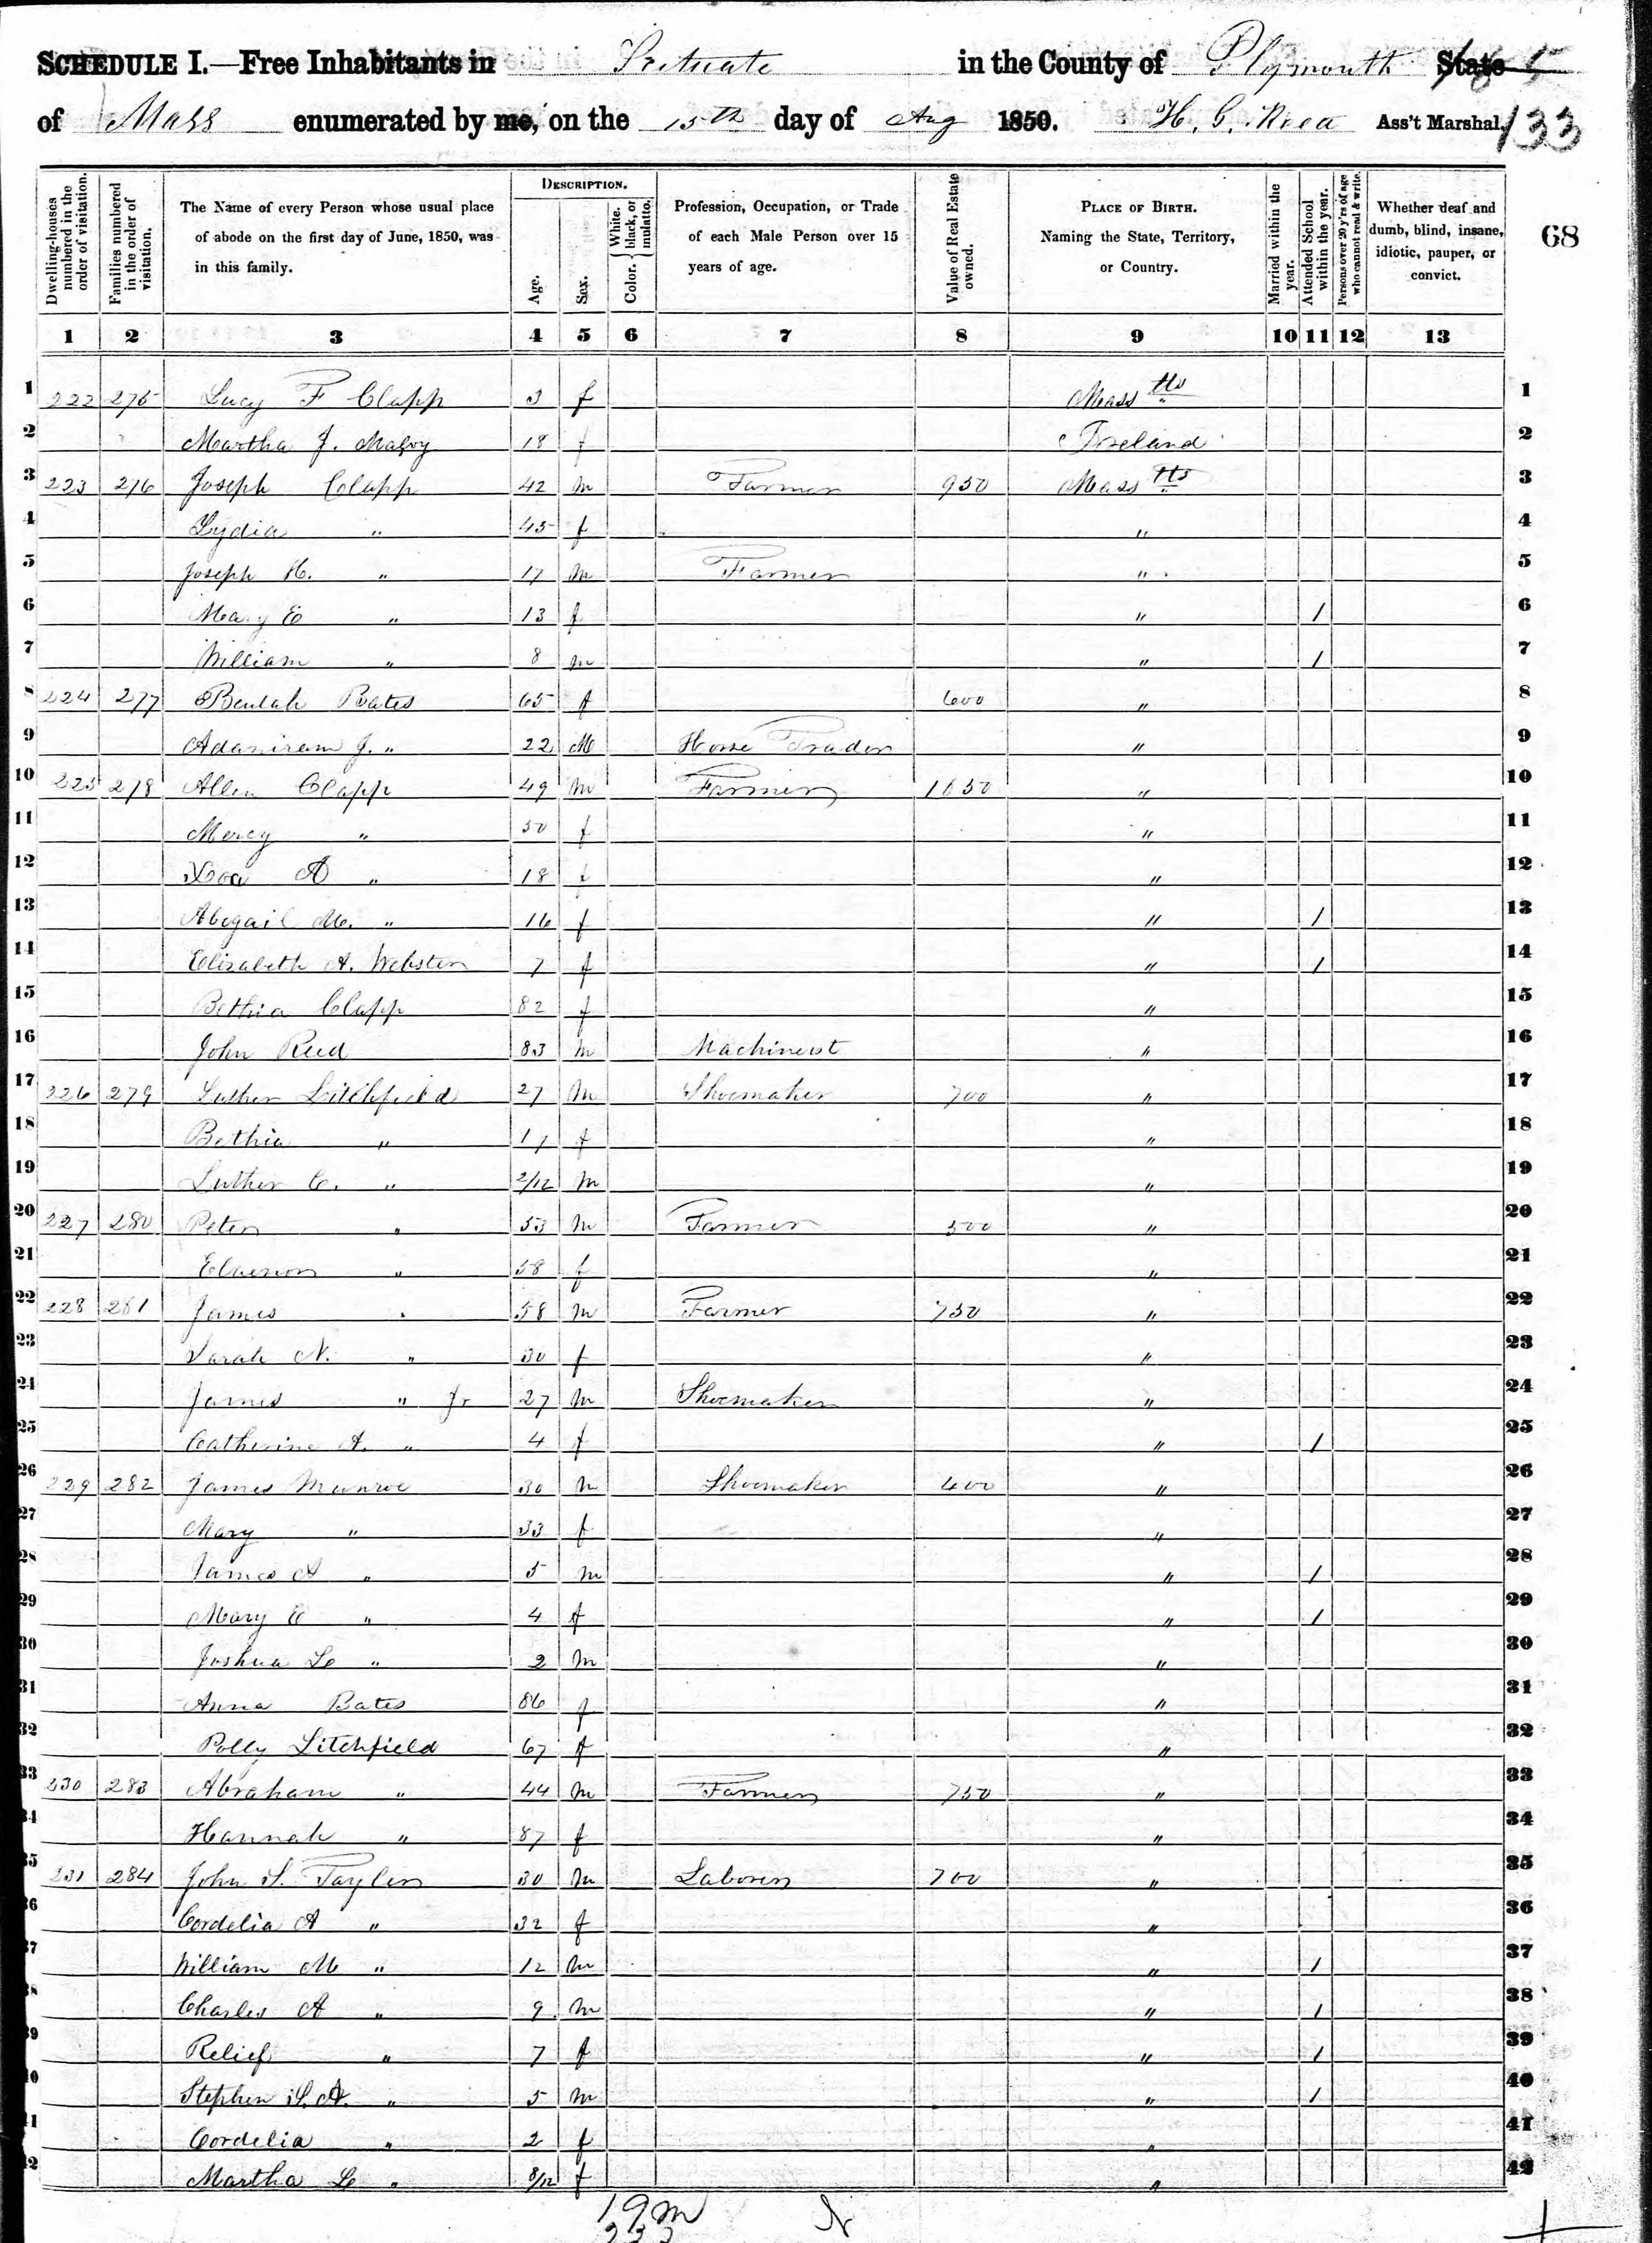 1850 - History - U.S. Census Bureau